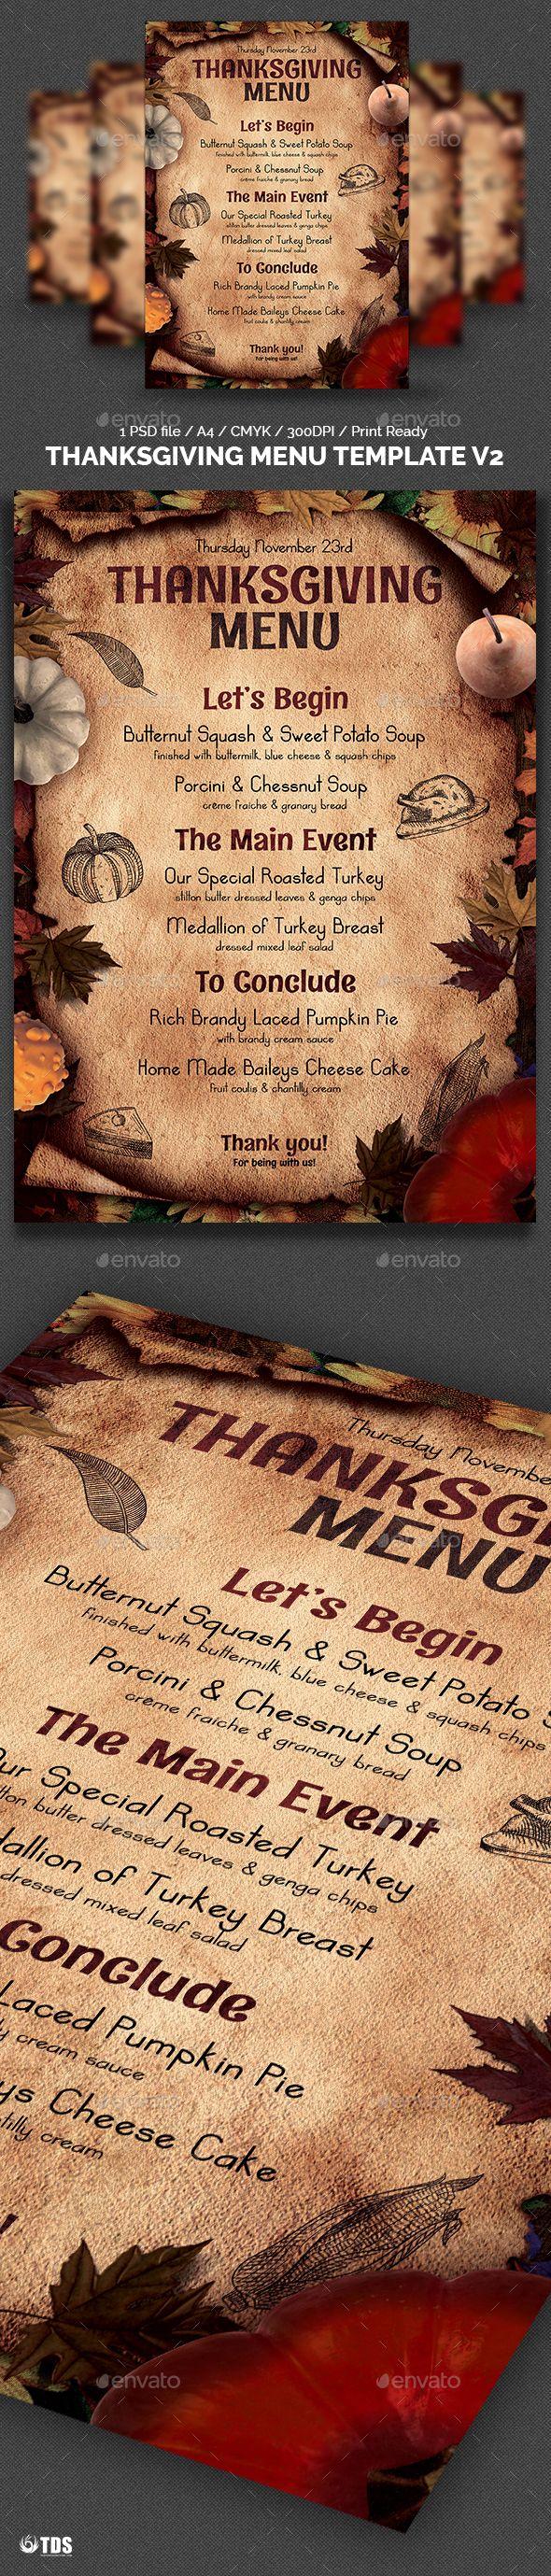 19 best Menus images on Pinterest | Restaurant branding, Graph ...